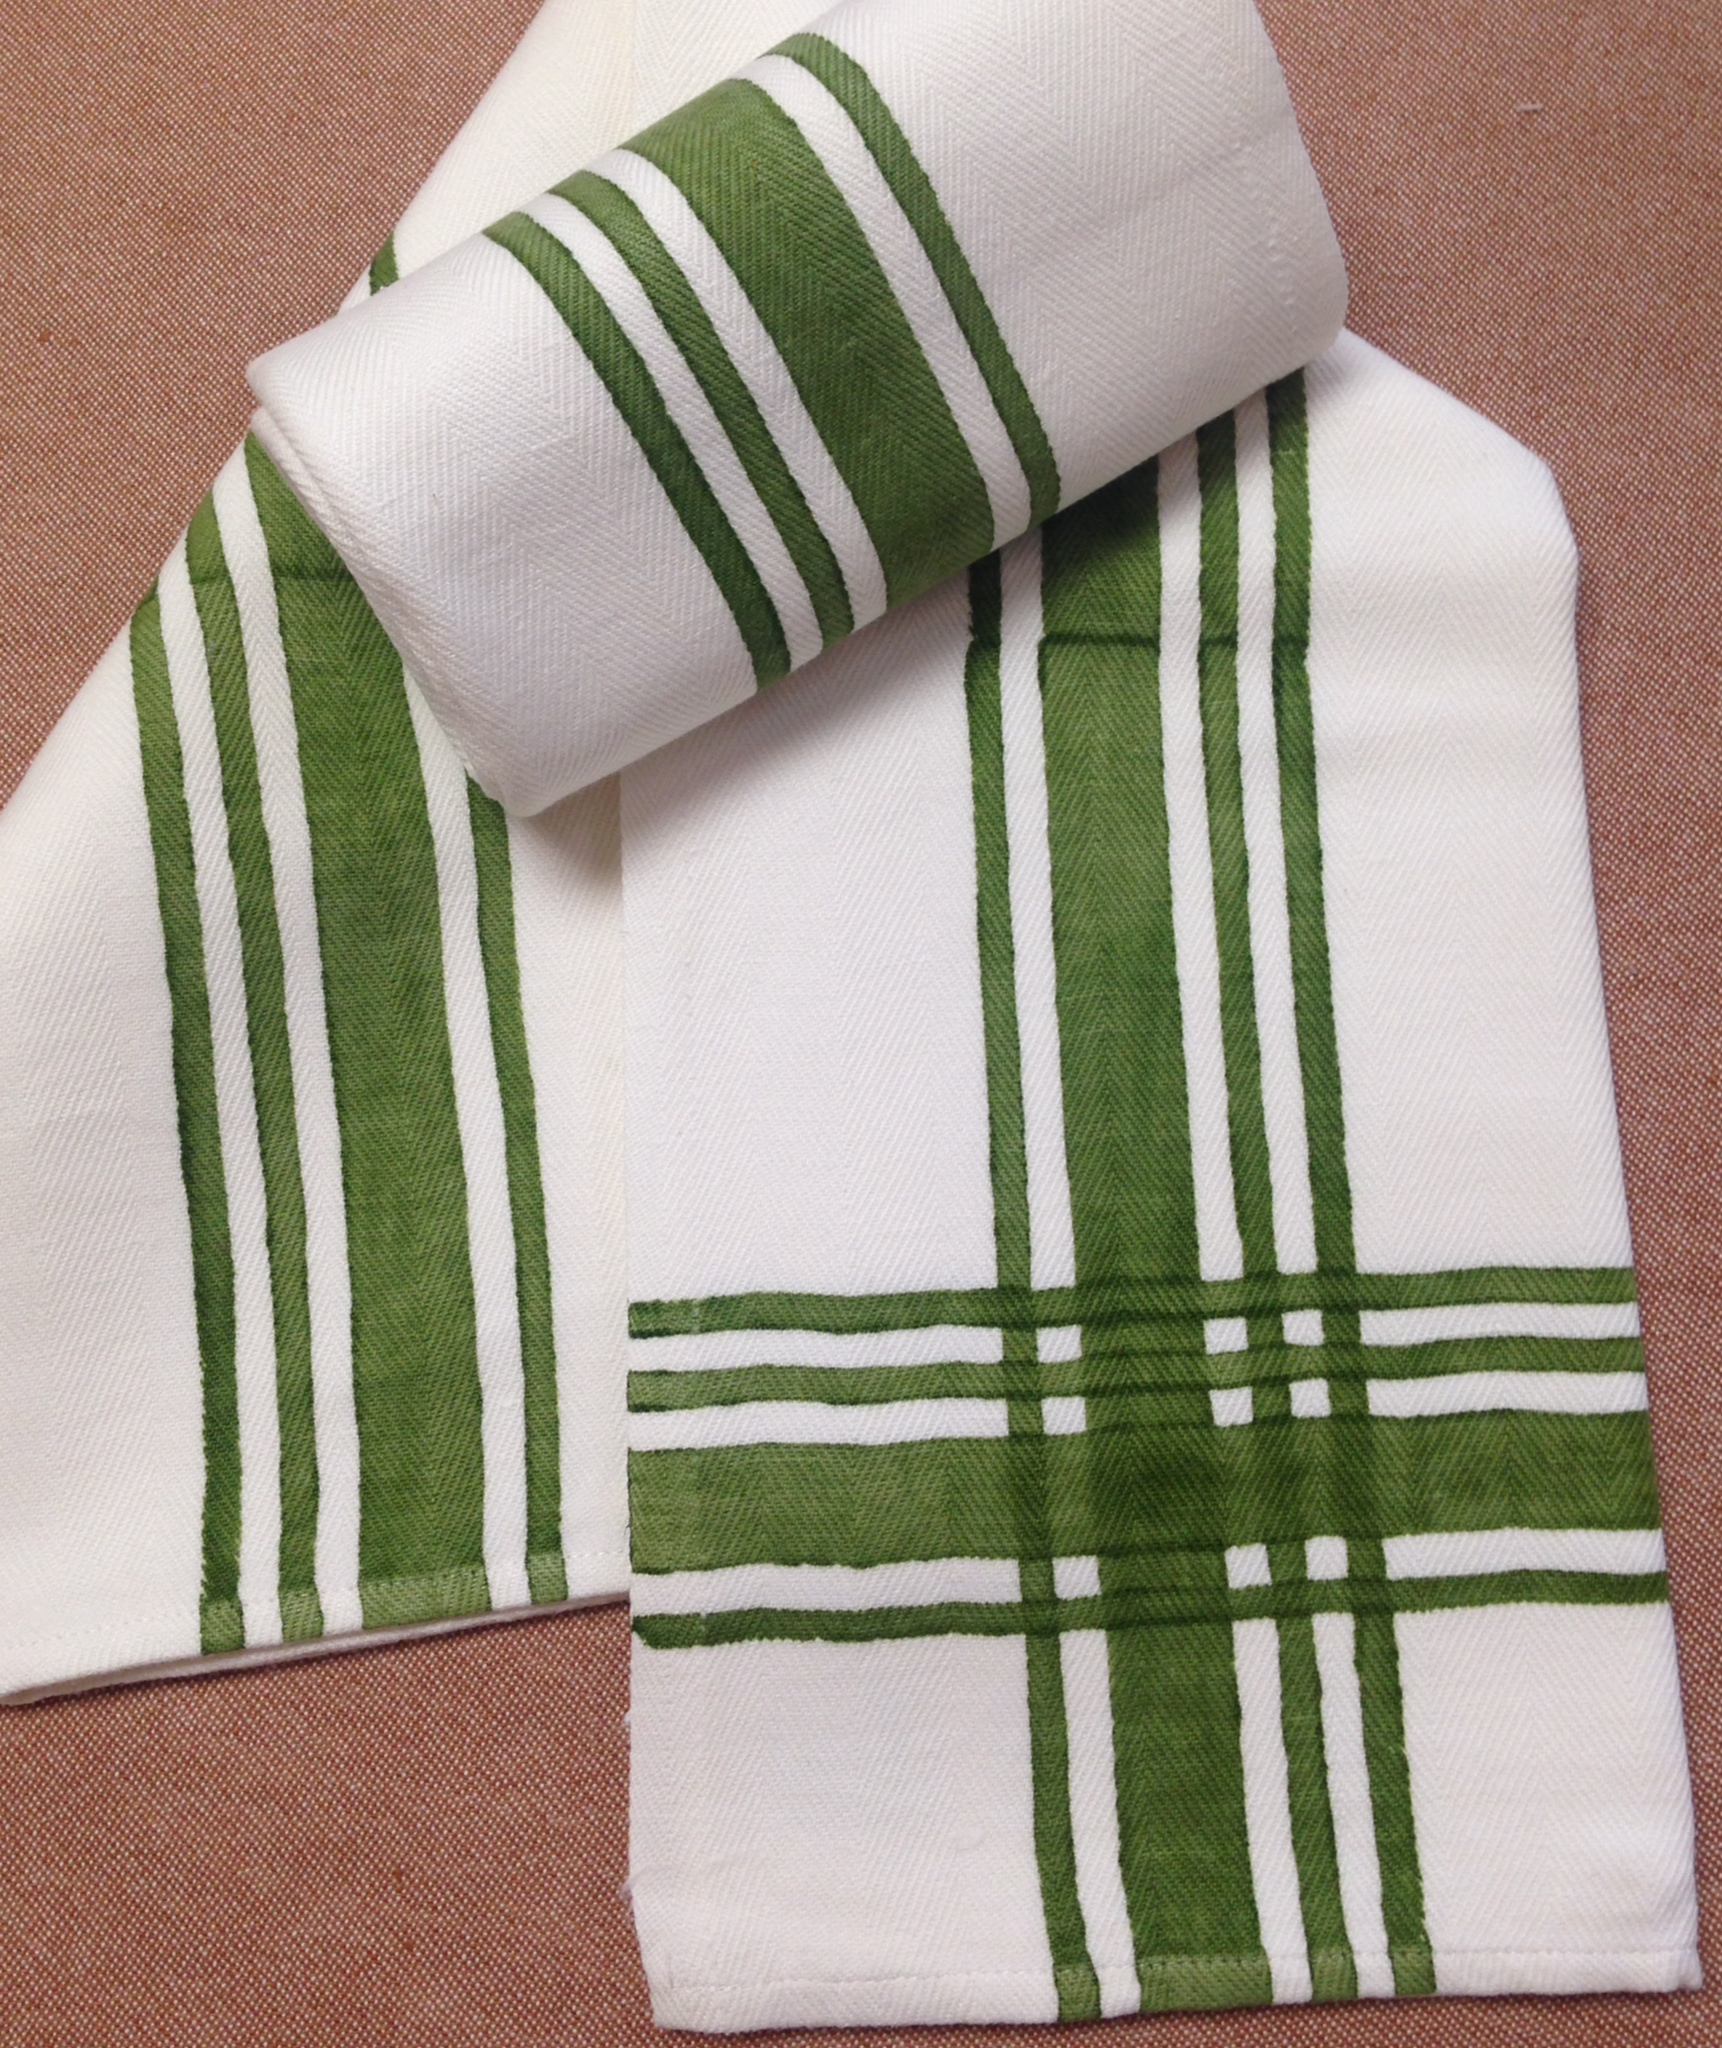 Stripe Kitchen Towel By Bertozzi Italian Bed Bath And